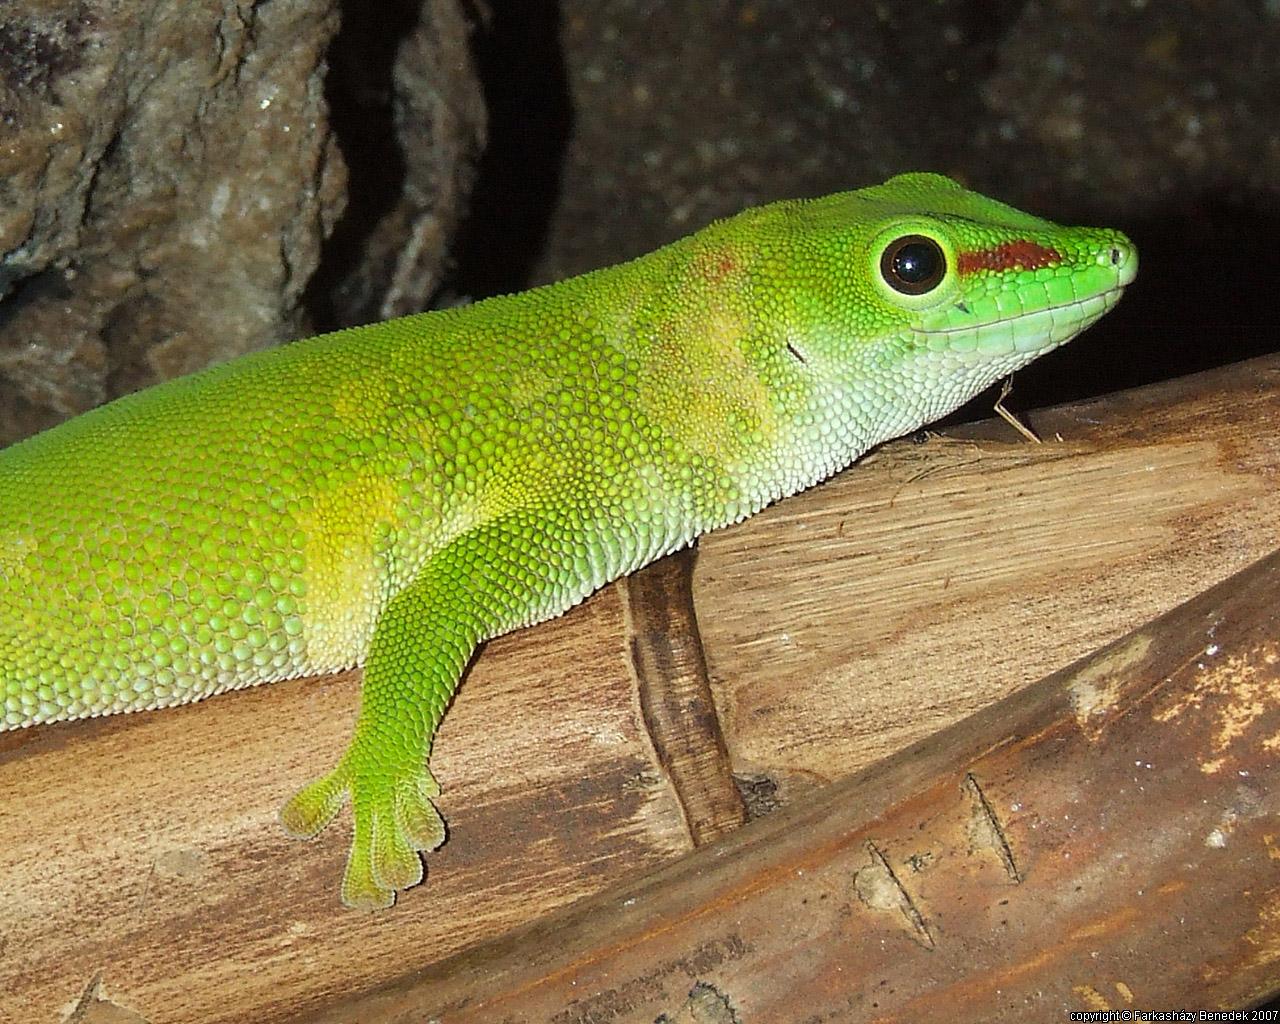 Lizard - HD Wallpapers   Earth Blog